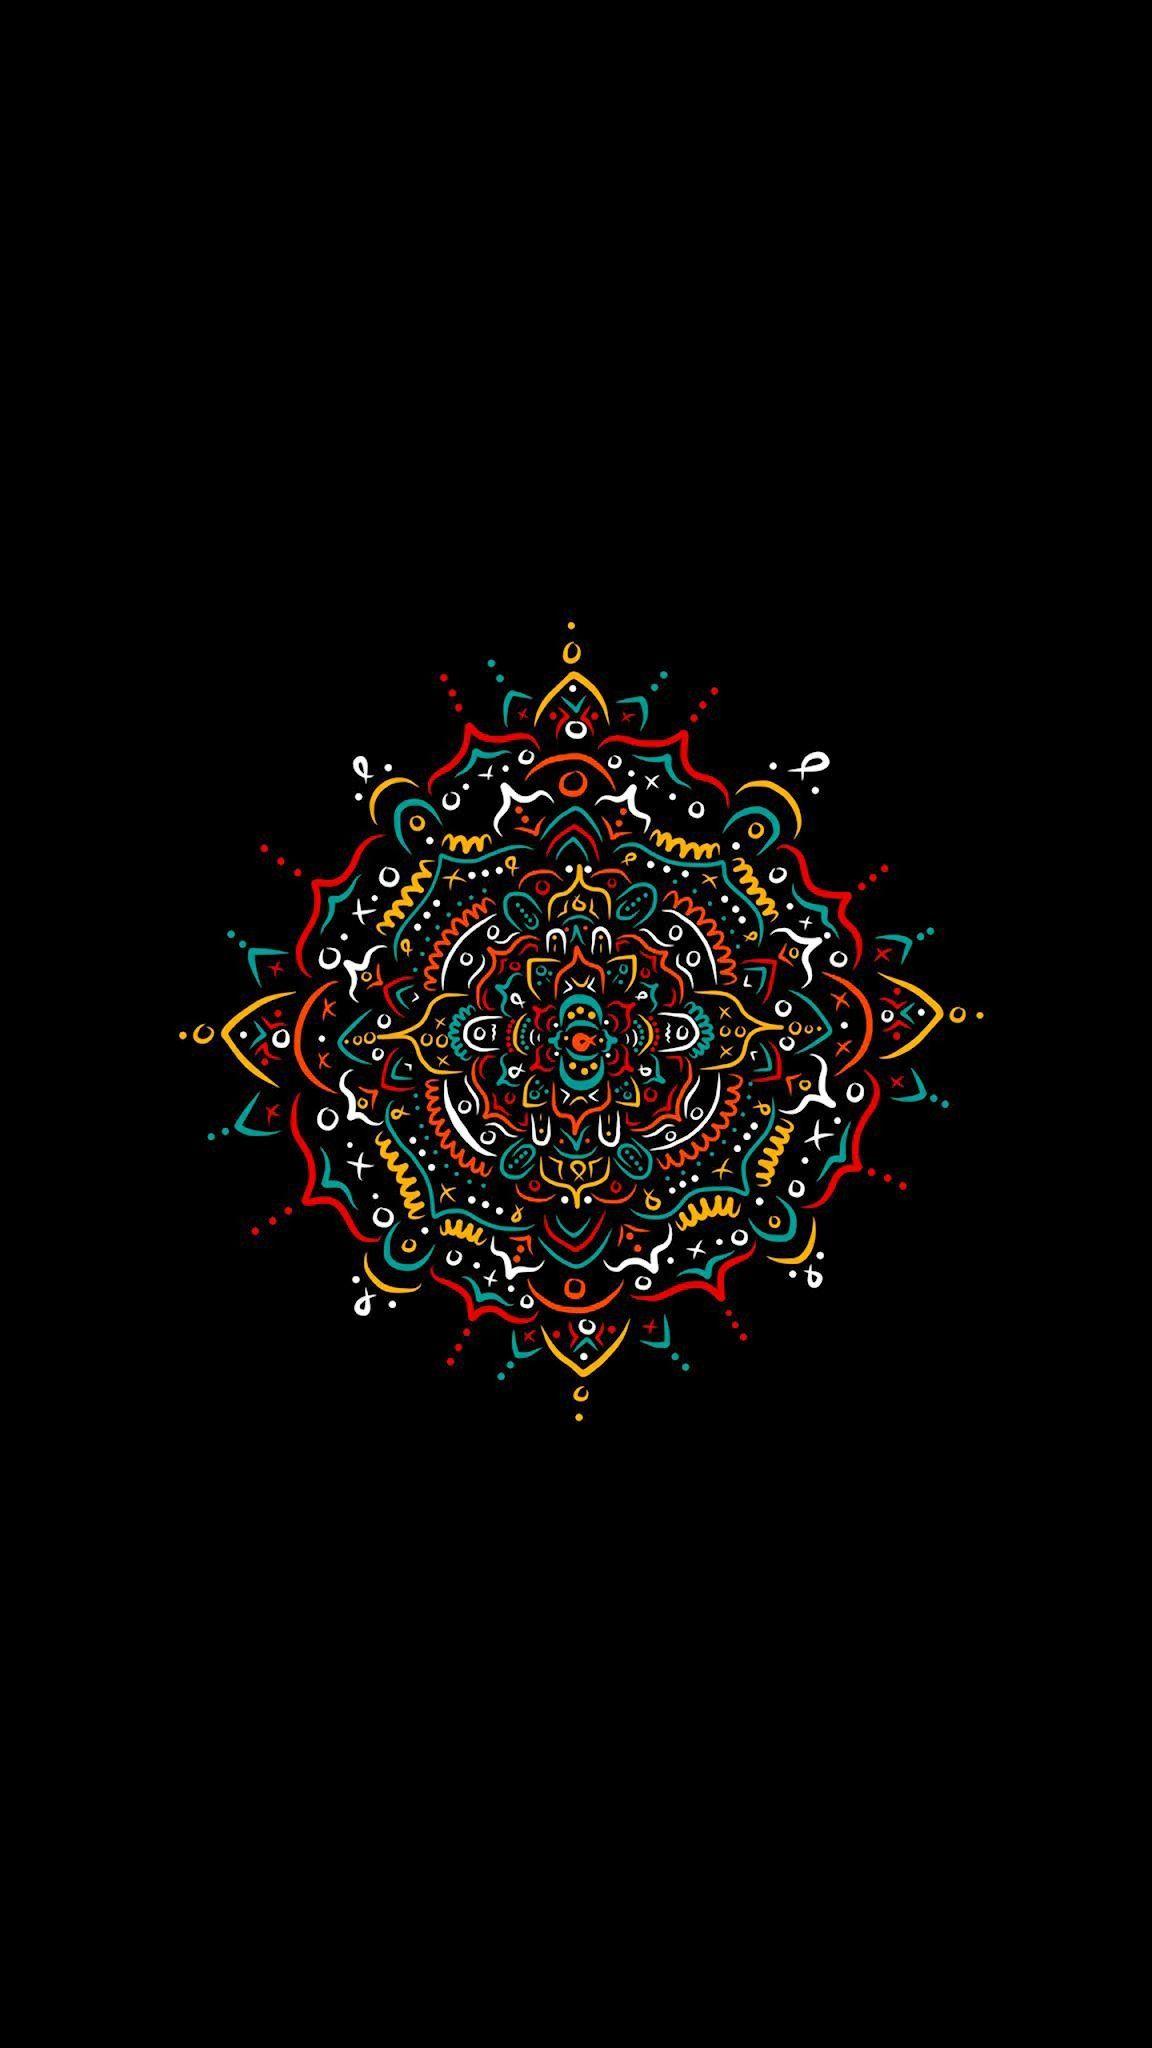 Pin By M On Colour Full B W Mandala Wallpaper Art Wallpaper Iphone Dark Wallpaper